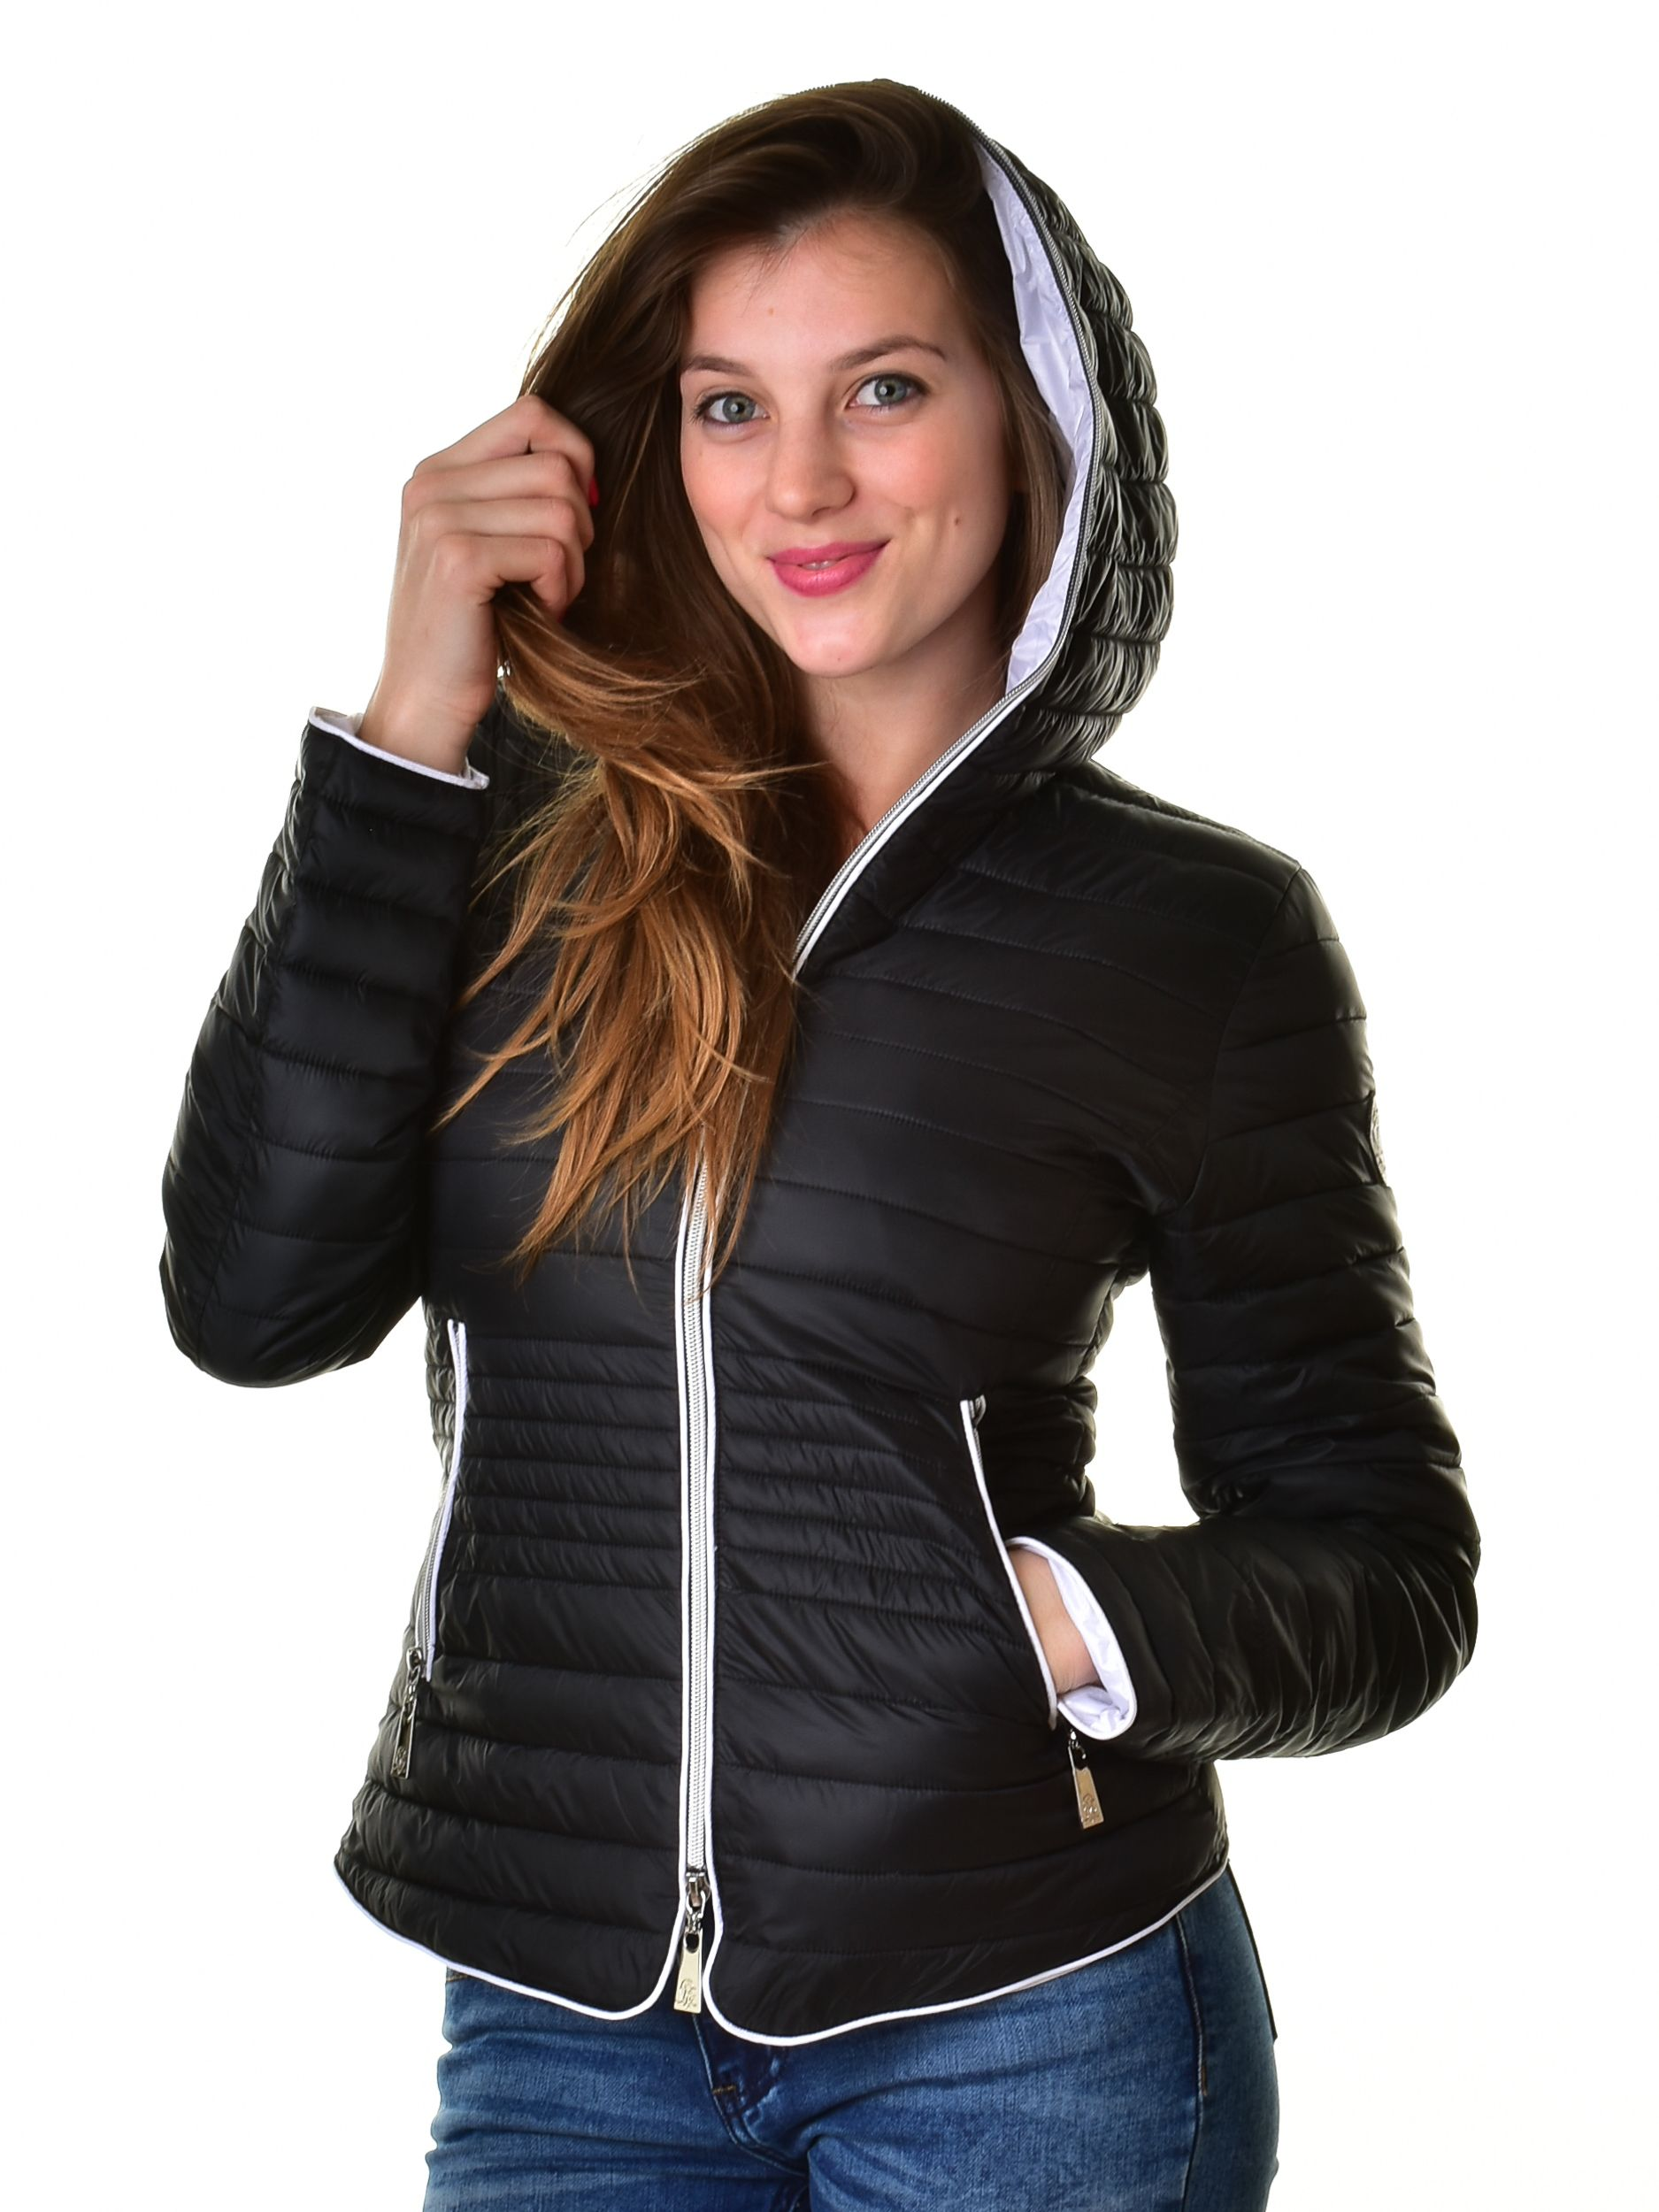 Mayo Chix női átmeneti kabát NINA | Markasbolt.hu Hivatalos